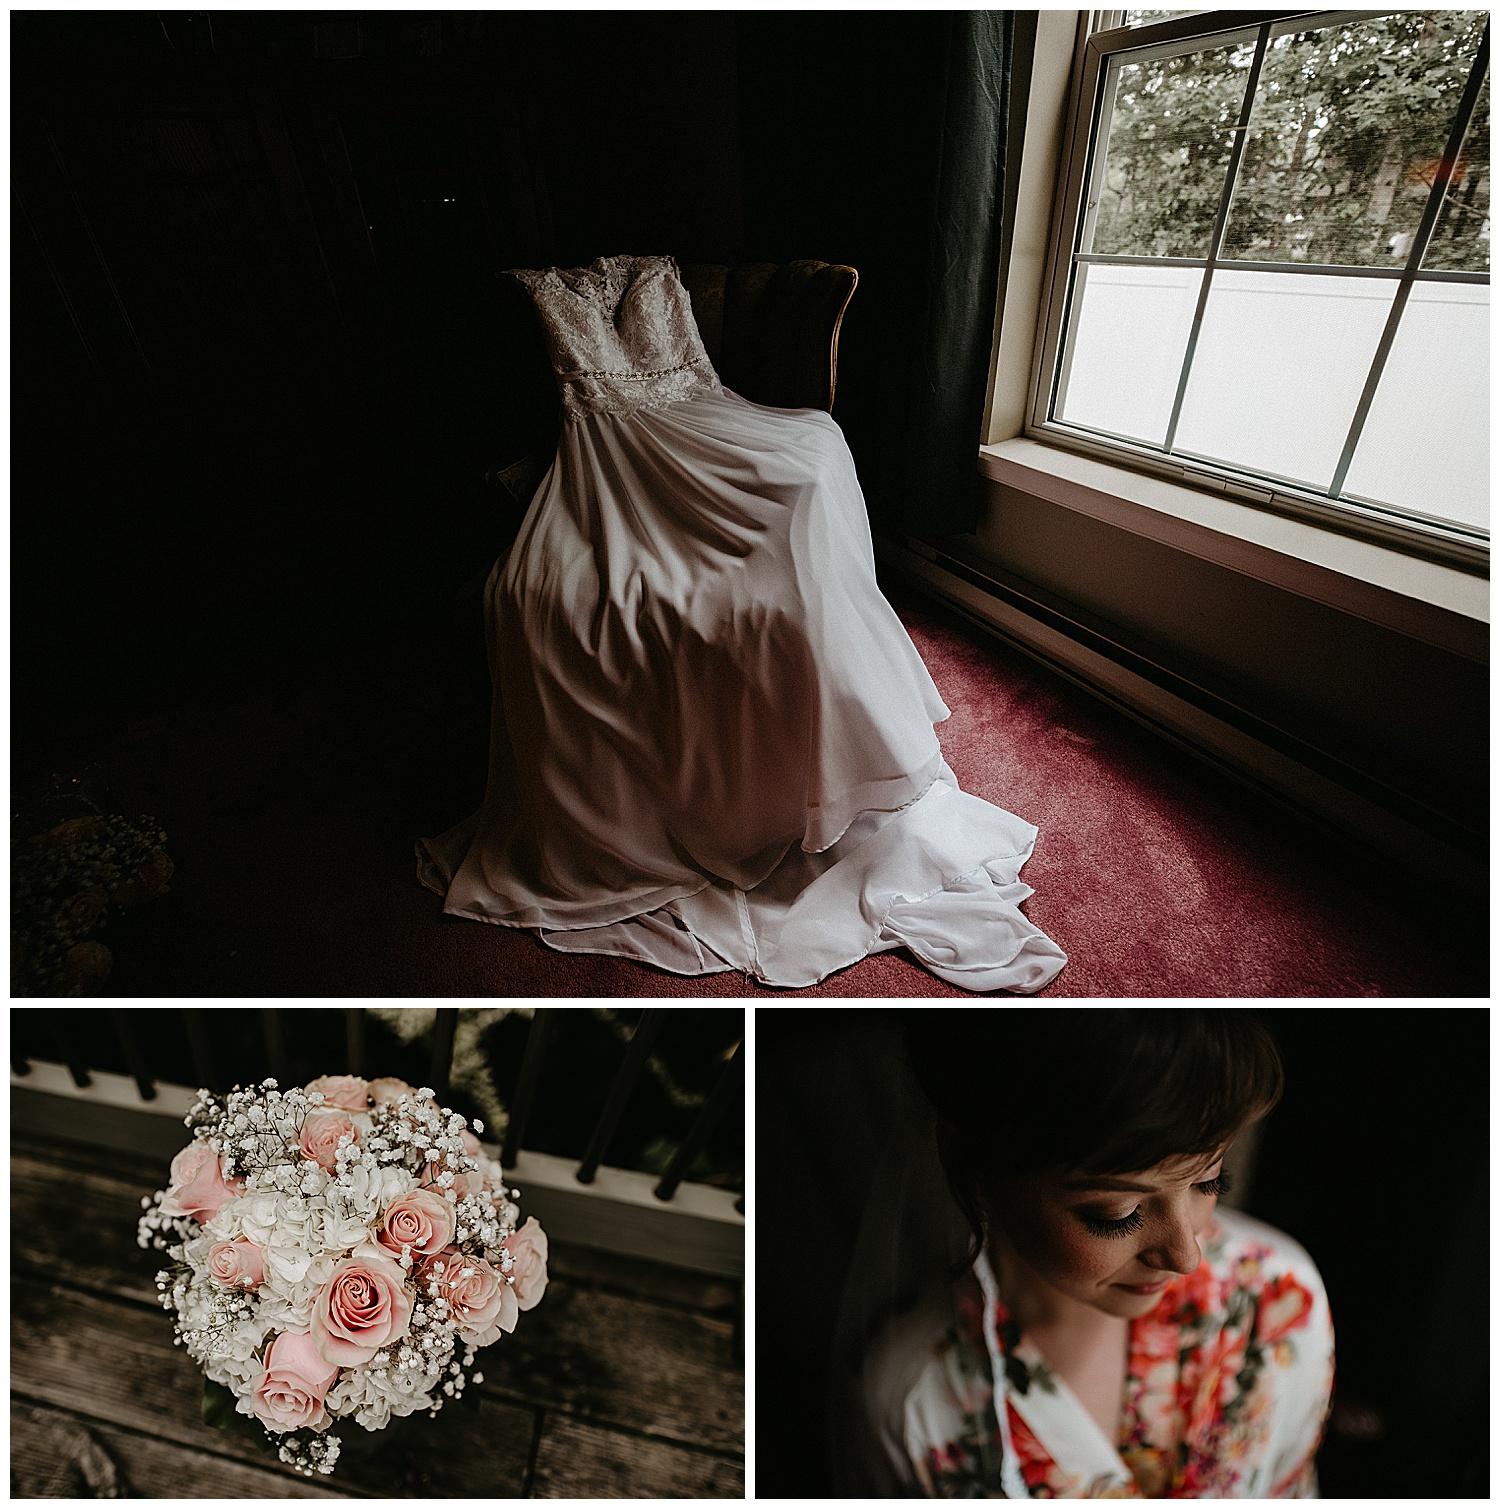 NEPA-Mount-Pocono-Wedding-Photographer-at-the-Stroudsmoor-Country-Inn-Stroudsburg-PA_0069.jpg